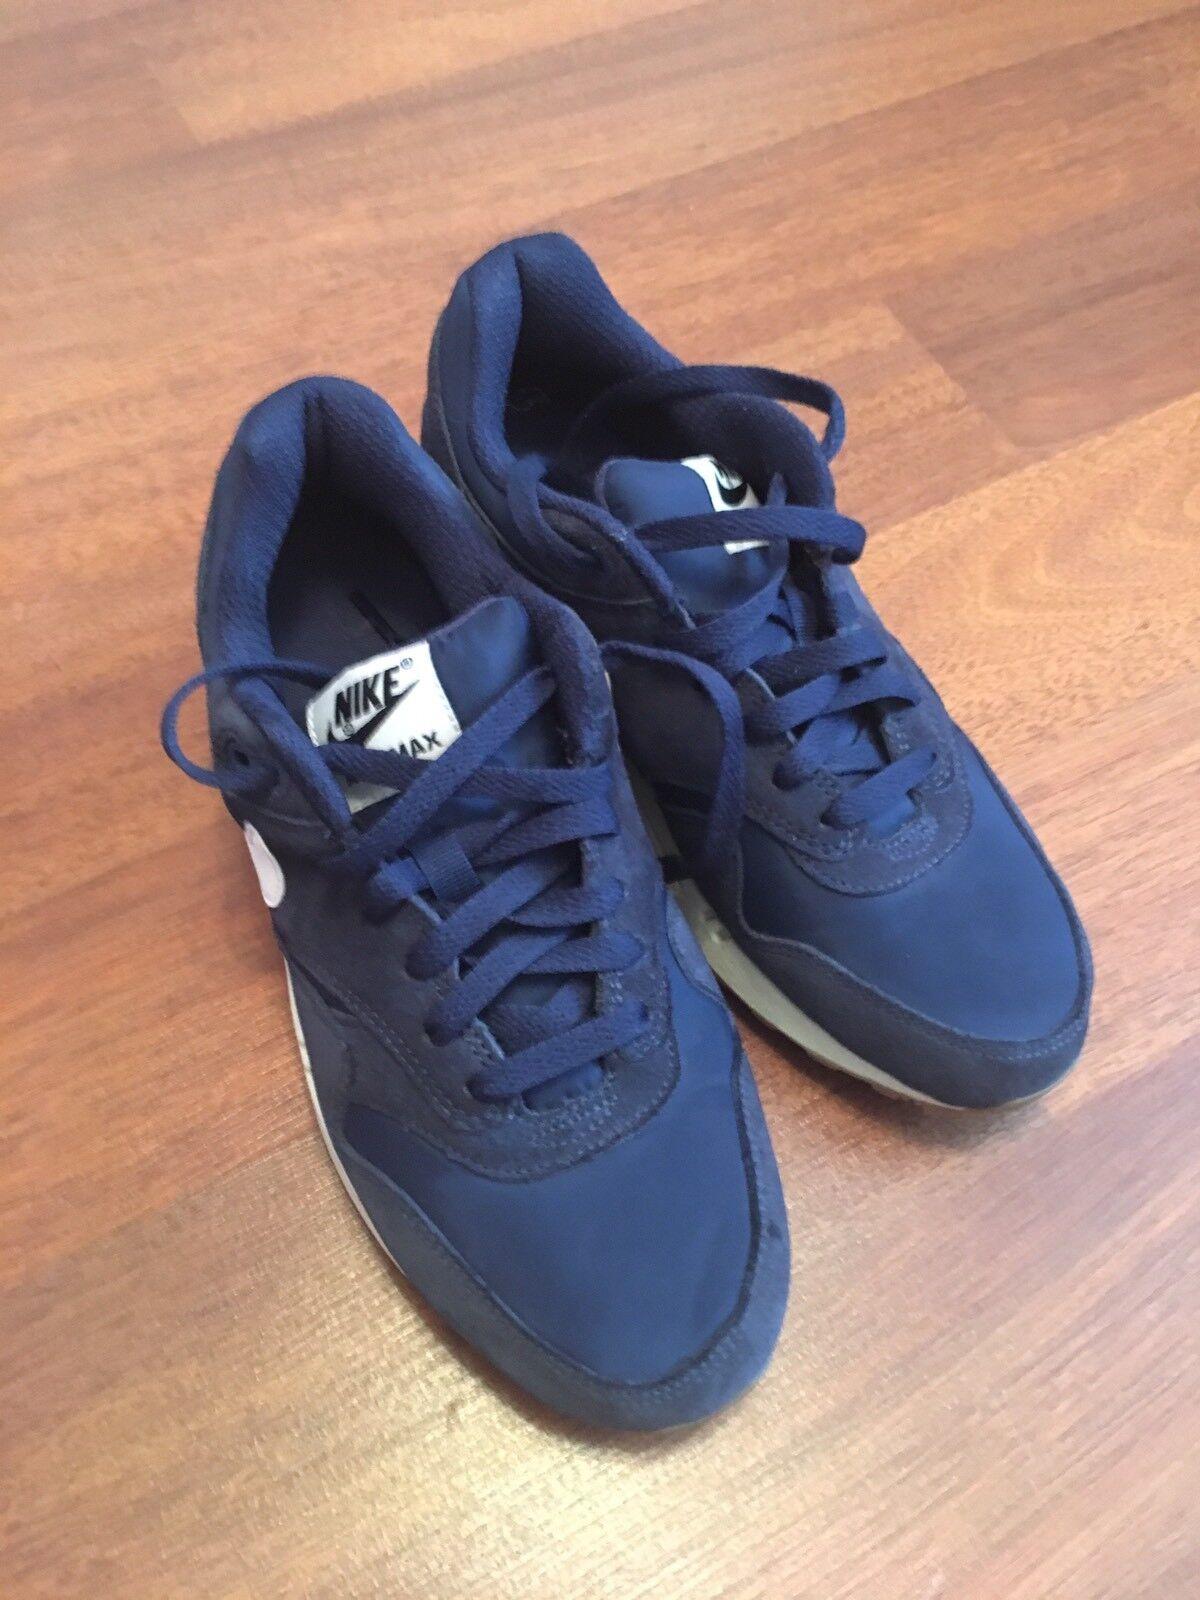 40 Design Modernes Damenschuhe Nike 4e42fcbvq21395 Schuhe